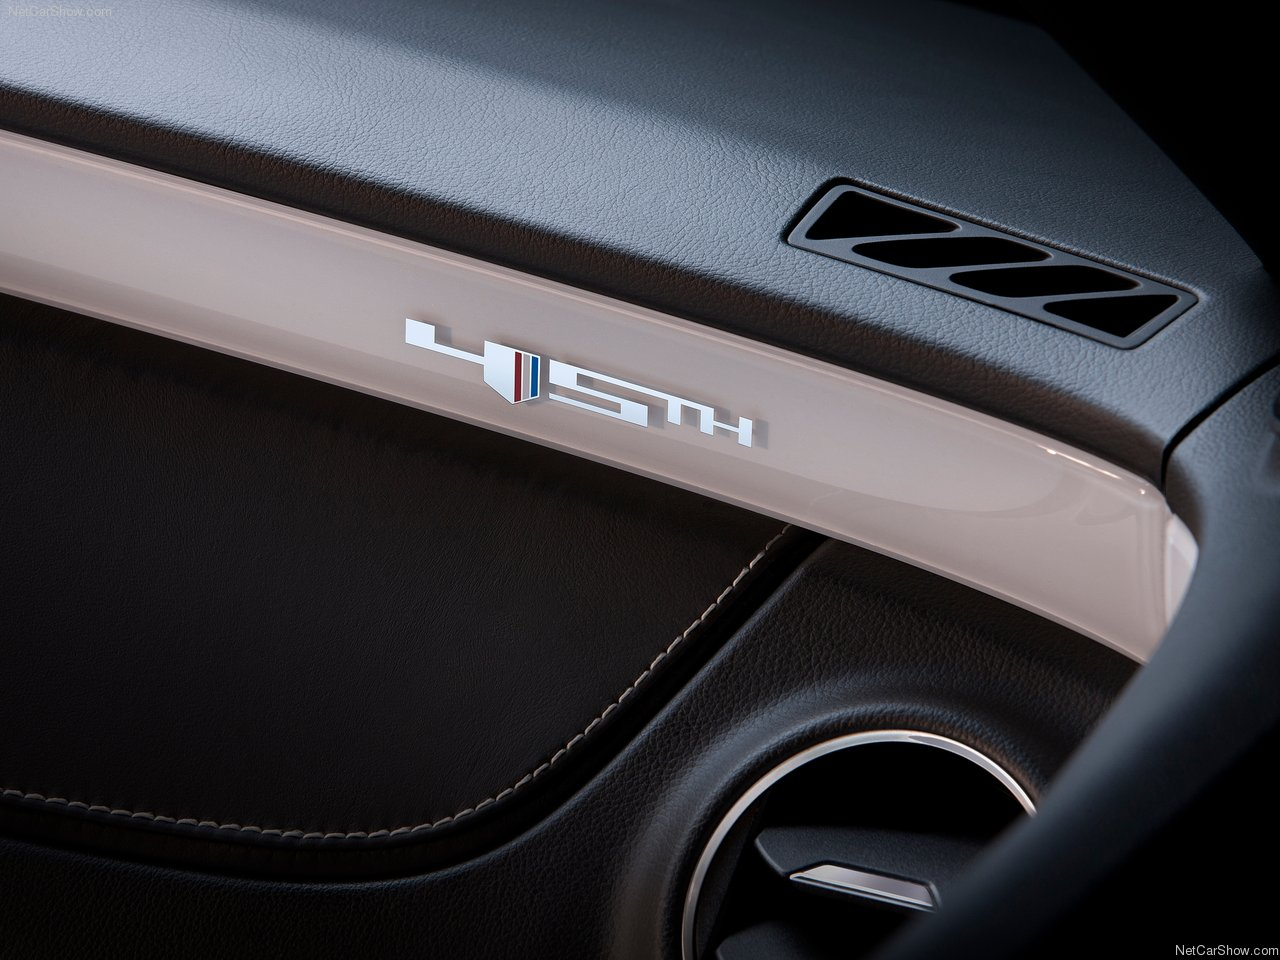 http://3.bp.blogspot.com/-fWGrpsDUb0w/TaXxeBtLObI/AAAAAAAAMuc/D5_3sTN_EAM/s1600/Chevrolet-Camaro_45th_Anniversary_Edition_2012_1280x960_wallpaper_07.jpg